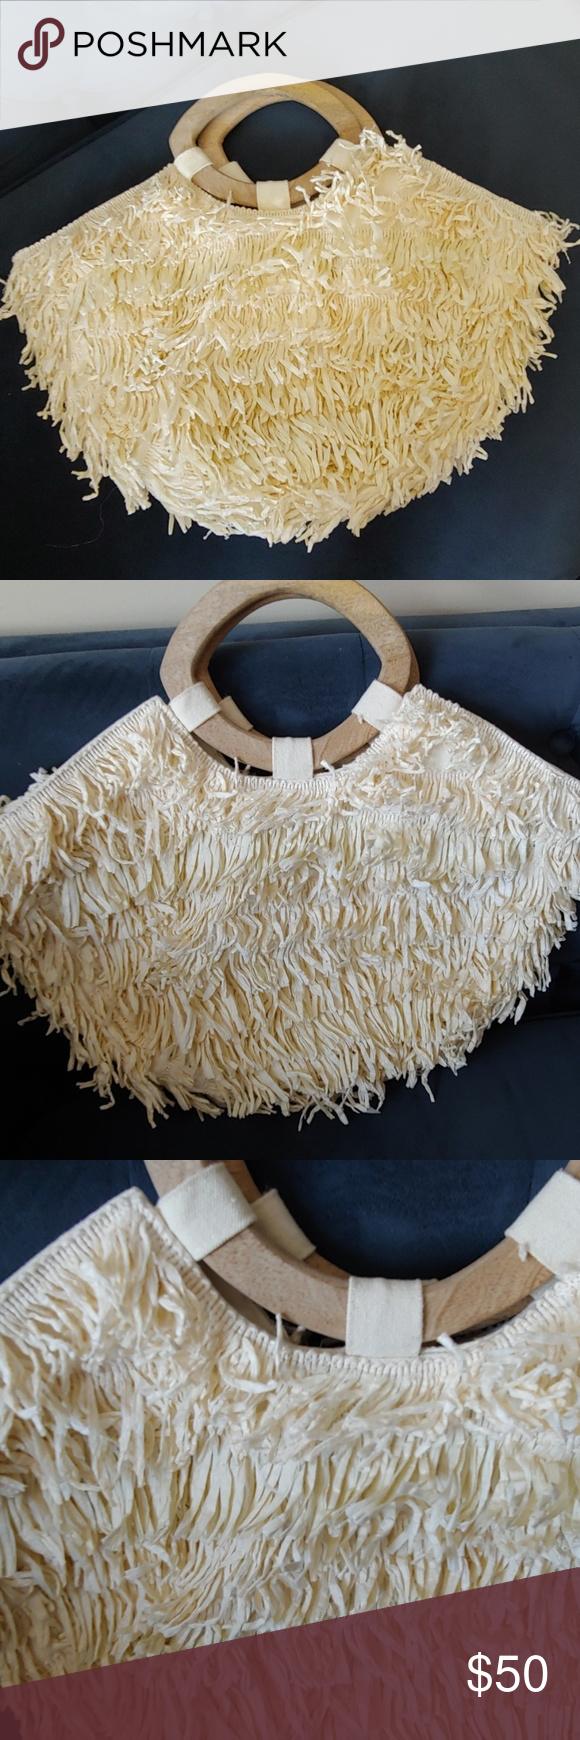 Anthropolgie NWT Rosalita Raffia Tote Bag NWT Anthropolgie Raffia Bag with wooden handle Rosalita fringed tote bag Anthropologie Bags #woodentotebag